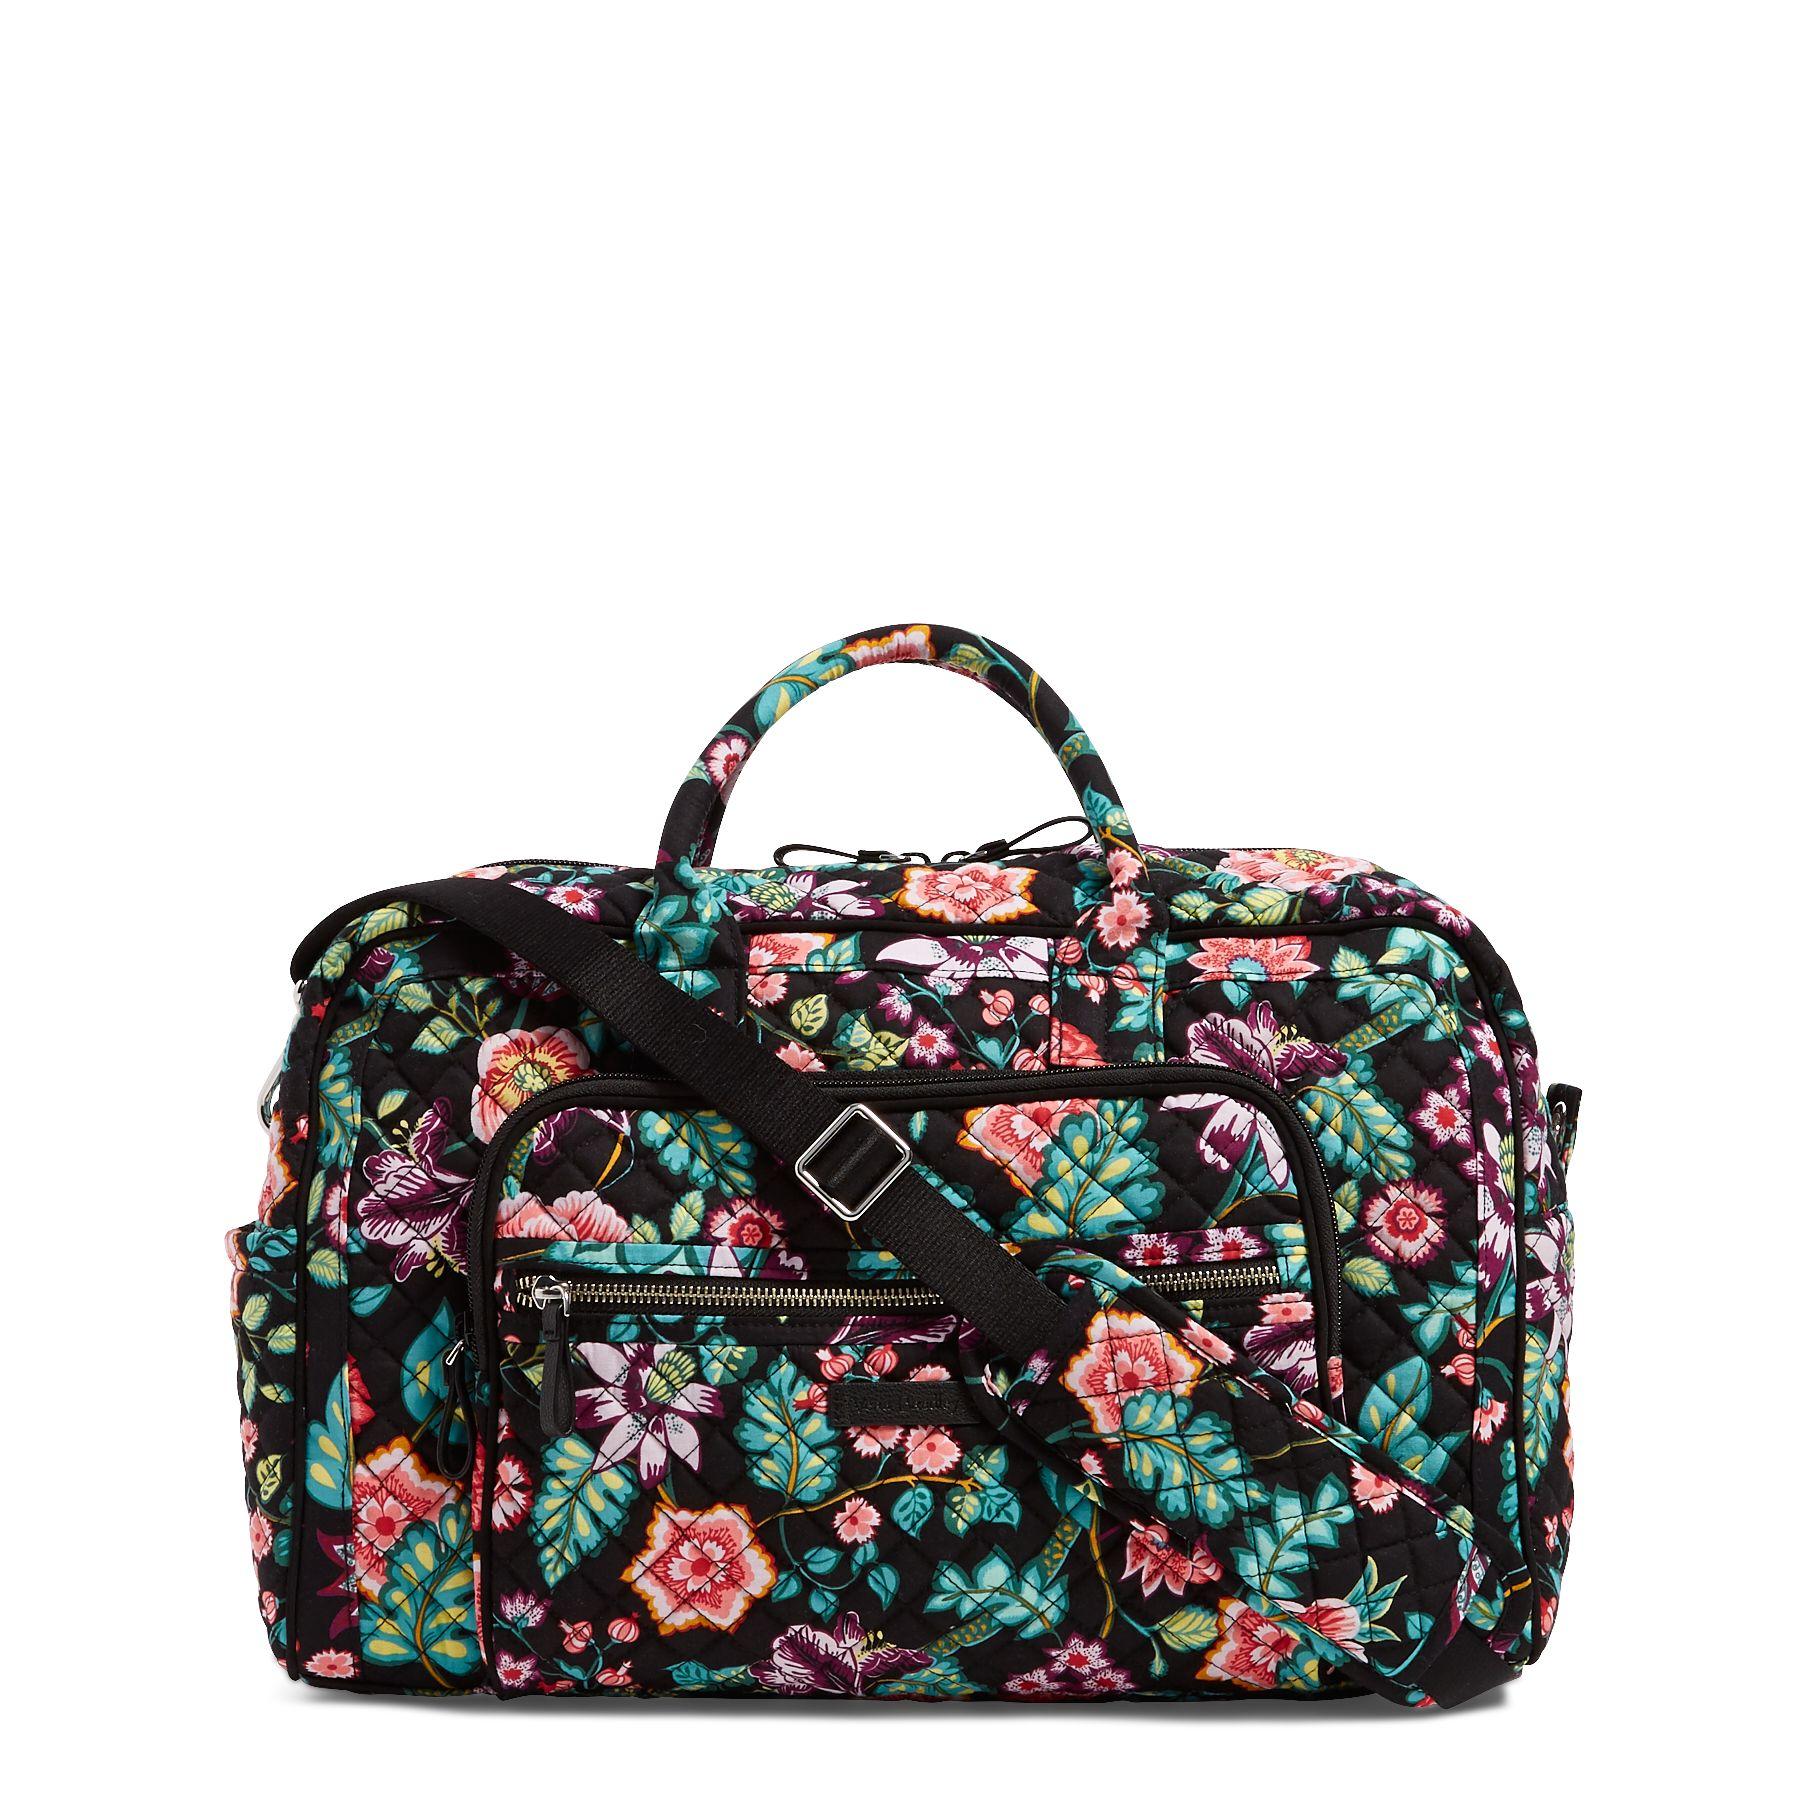 Iconic Compact Weekender Travel Bag Vera Bradley The 6 In 1 Secret Pouch Organiser Bgo 15